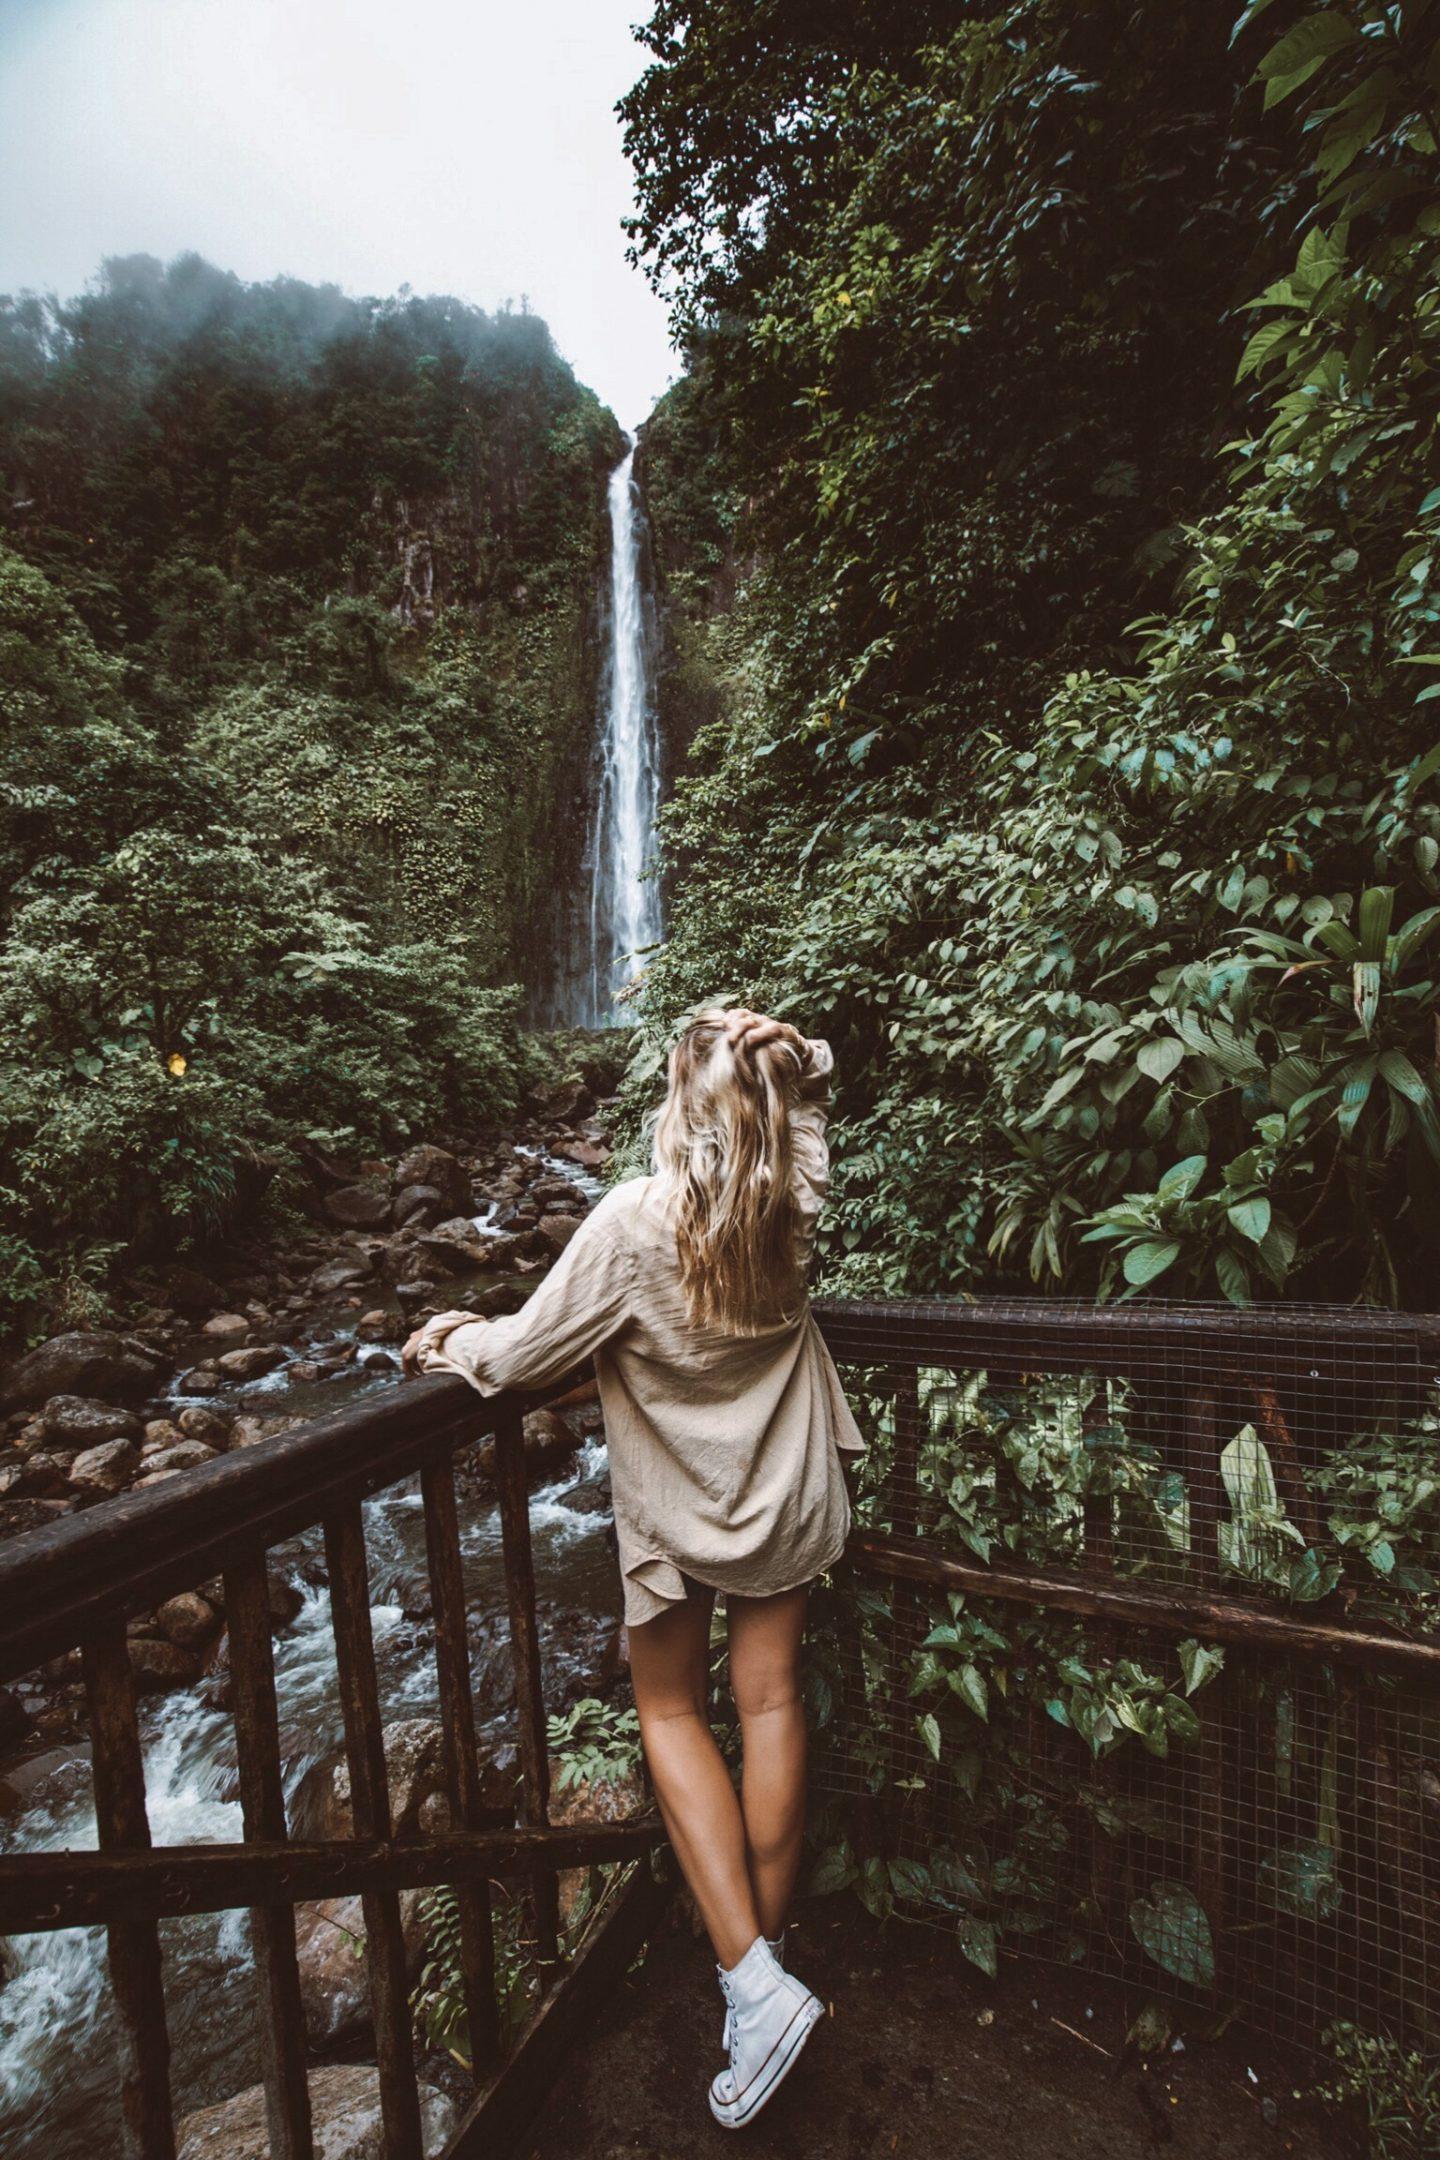 Randonnée Guadeloupe - Blondie Baby blog voyage et mode